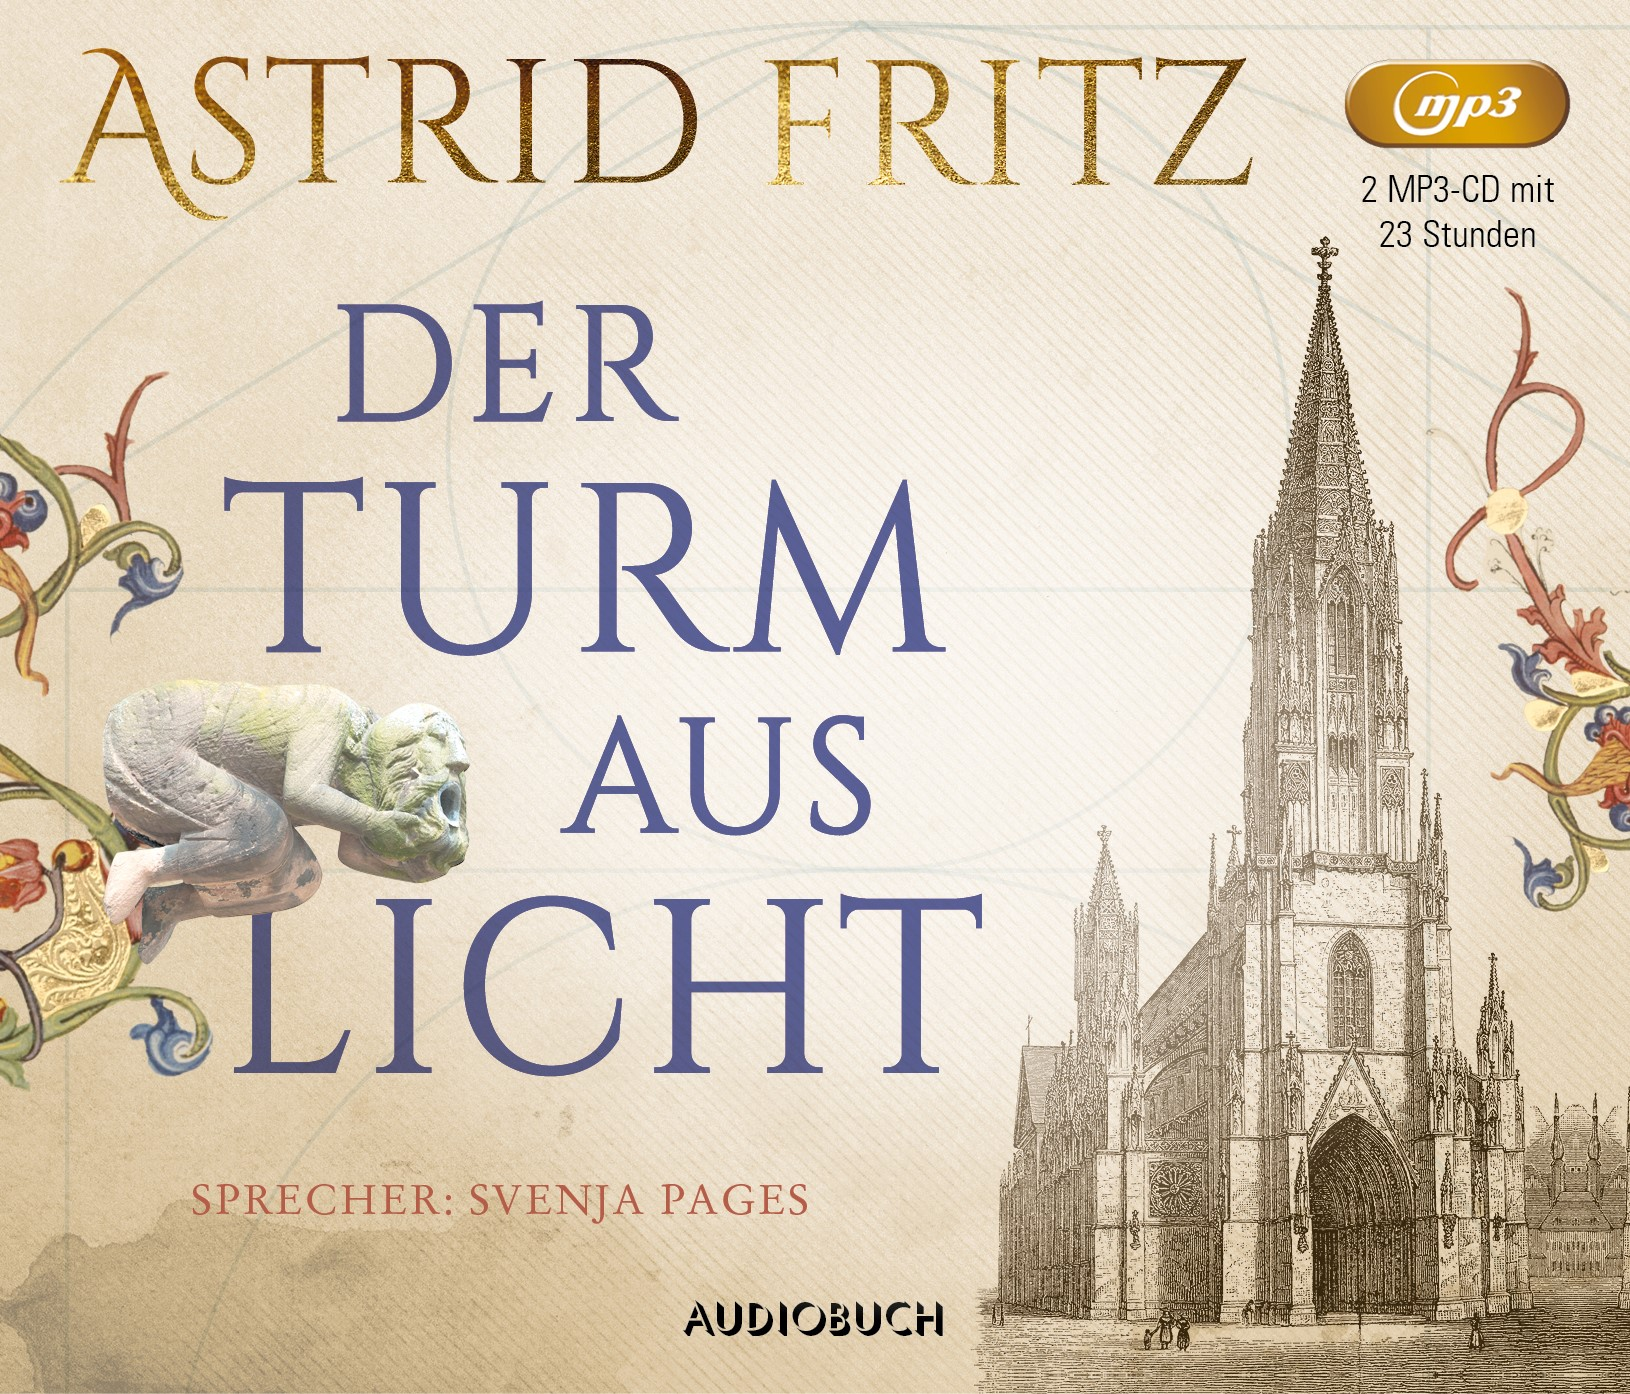 Muenster-Laden-Freiburg-Bueher-Hoerbuch-Firtz-Pages-Turm-aus-Licht